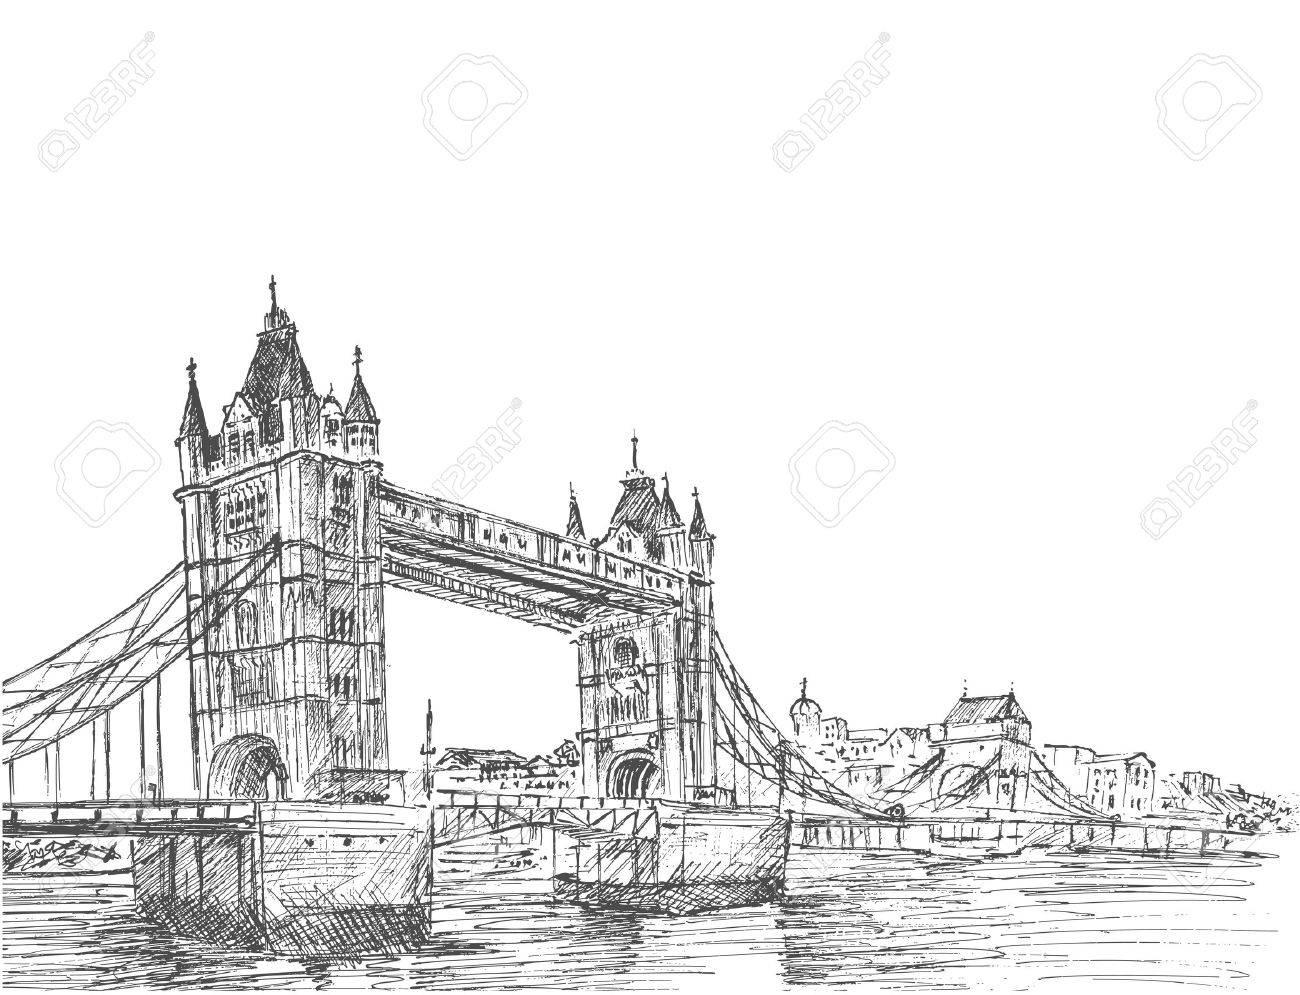 Hand Drawn sketch illustration of Tower Bridge, London, UK. - 59730871